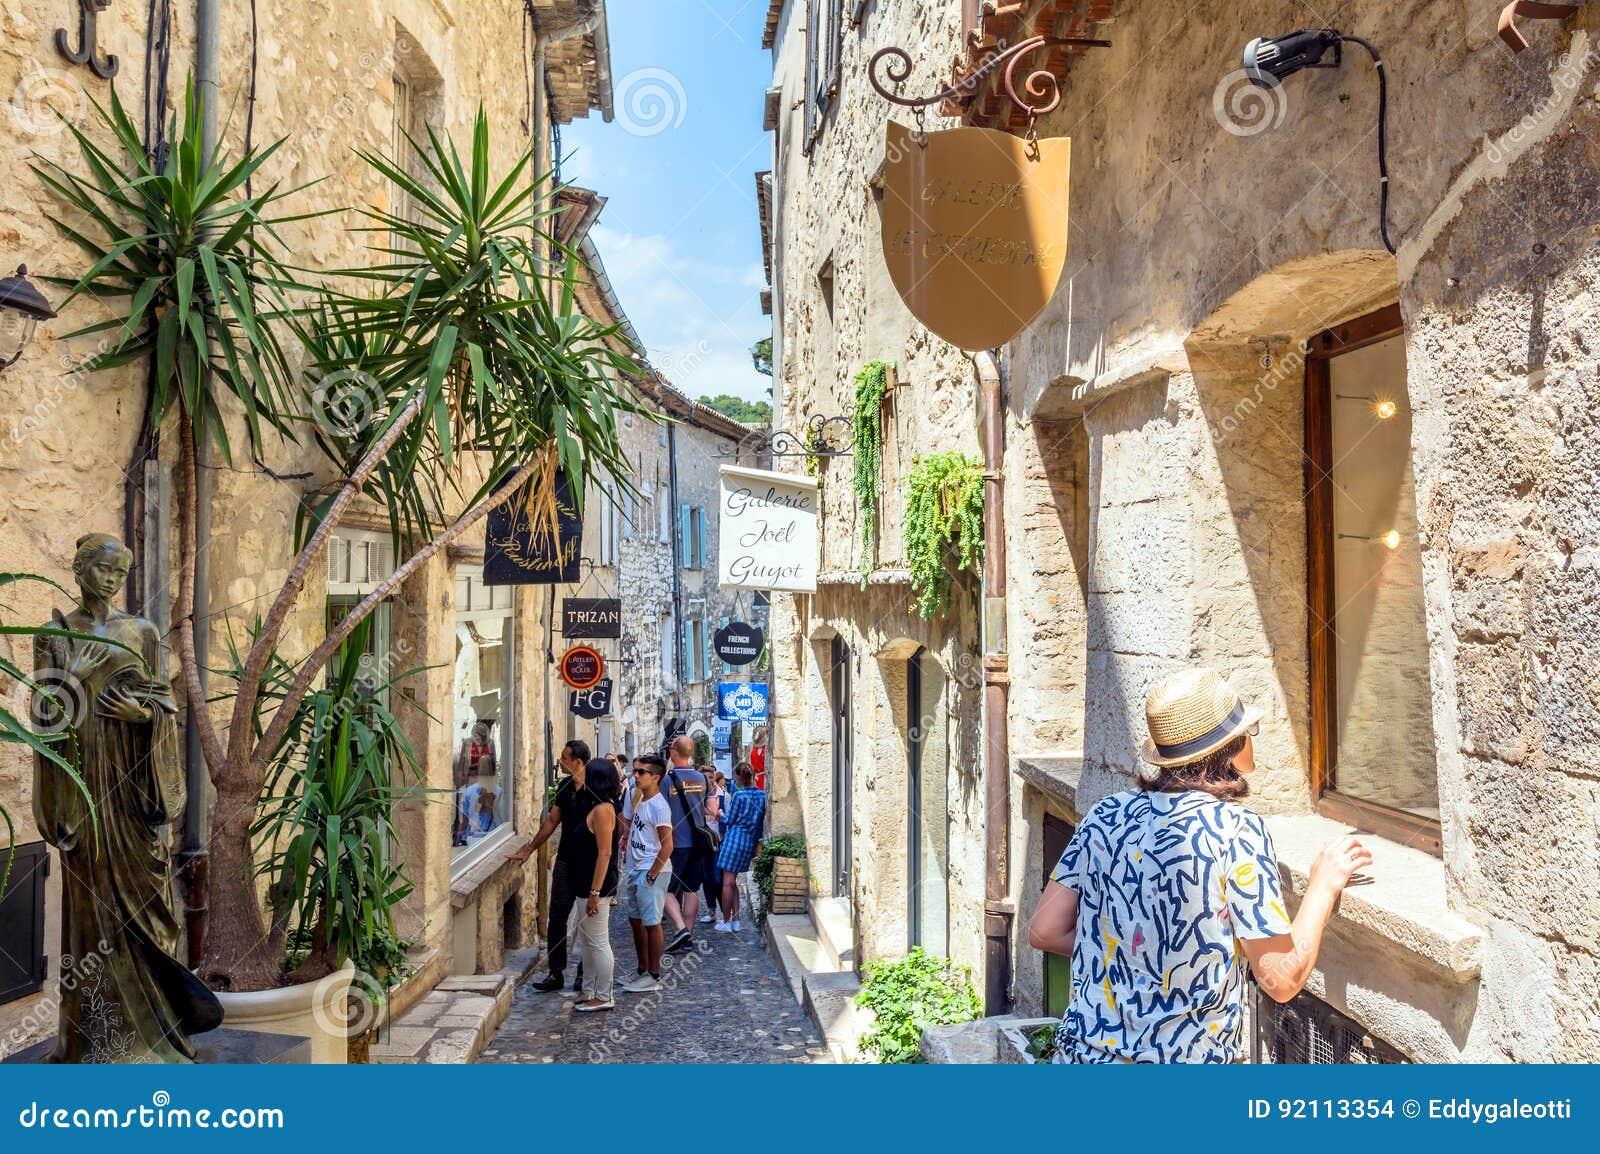 Saint Paul De Vence Art typical narrow street in saint paul de vence, france